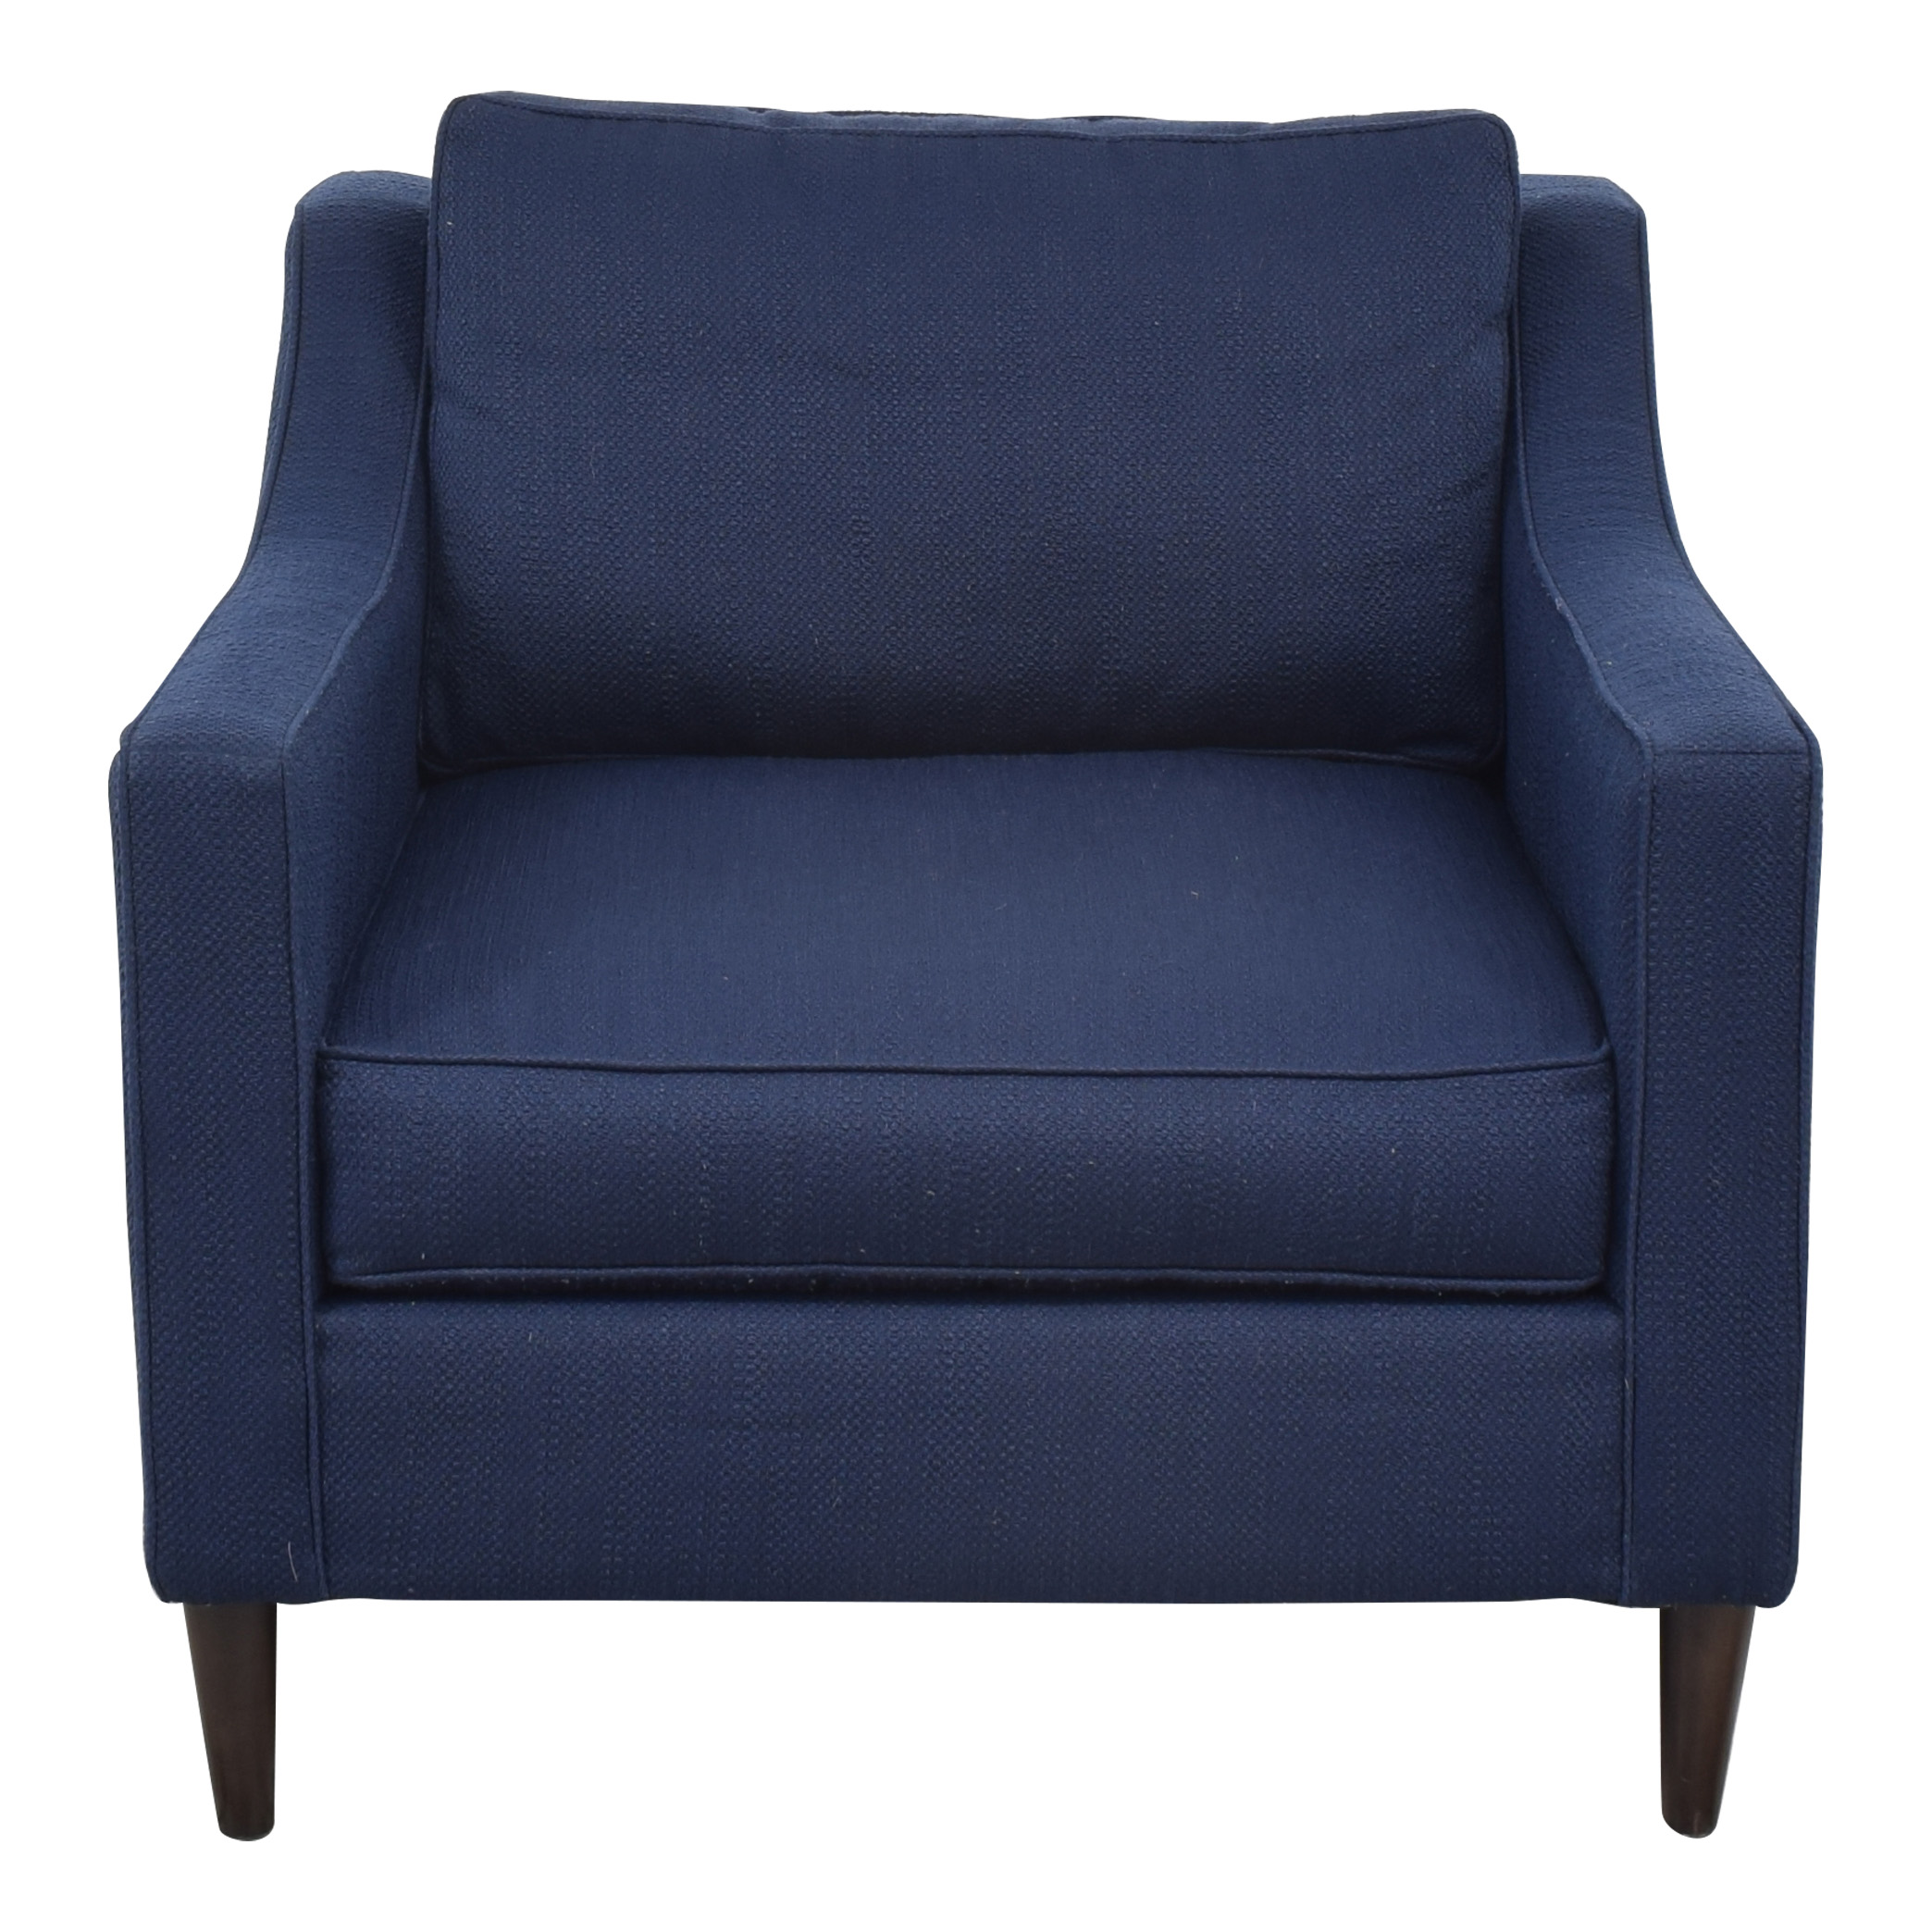 West Elm West Elm Paidge Chair Accent Chairs